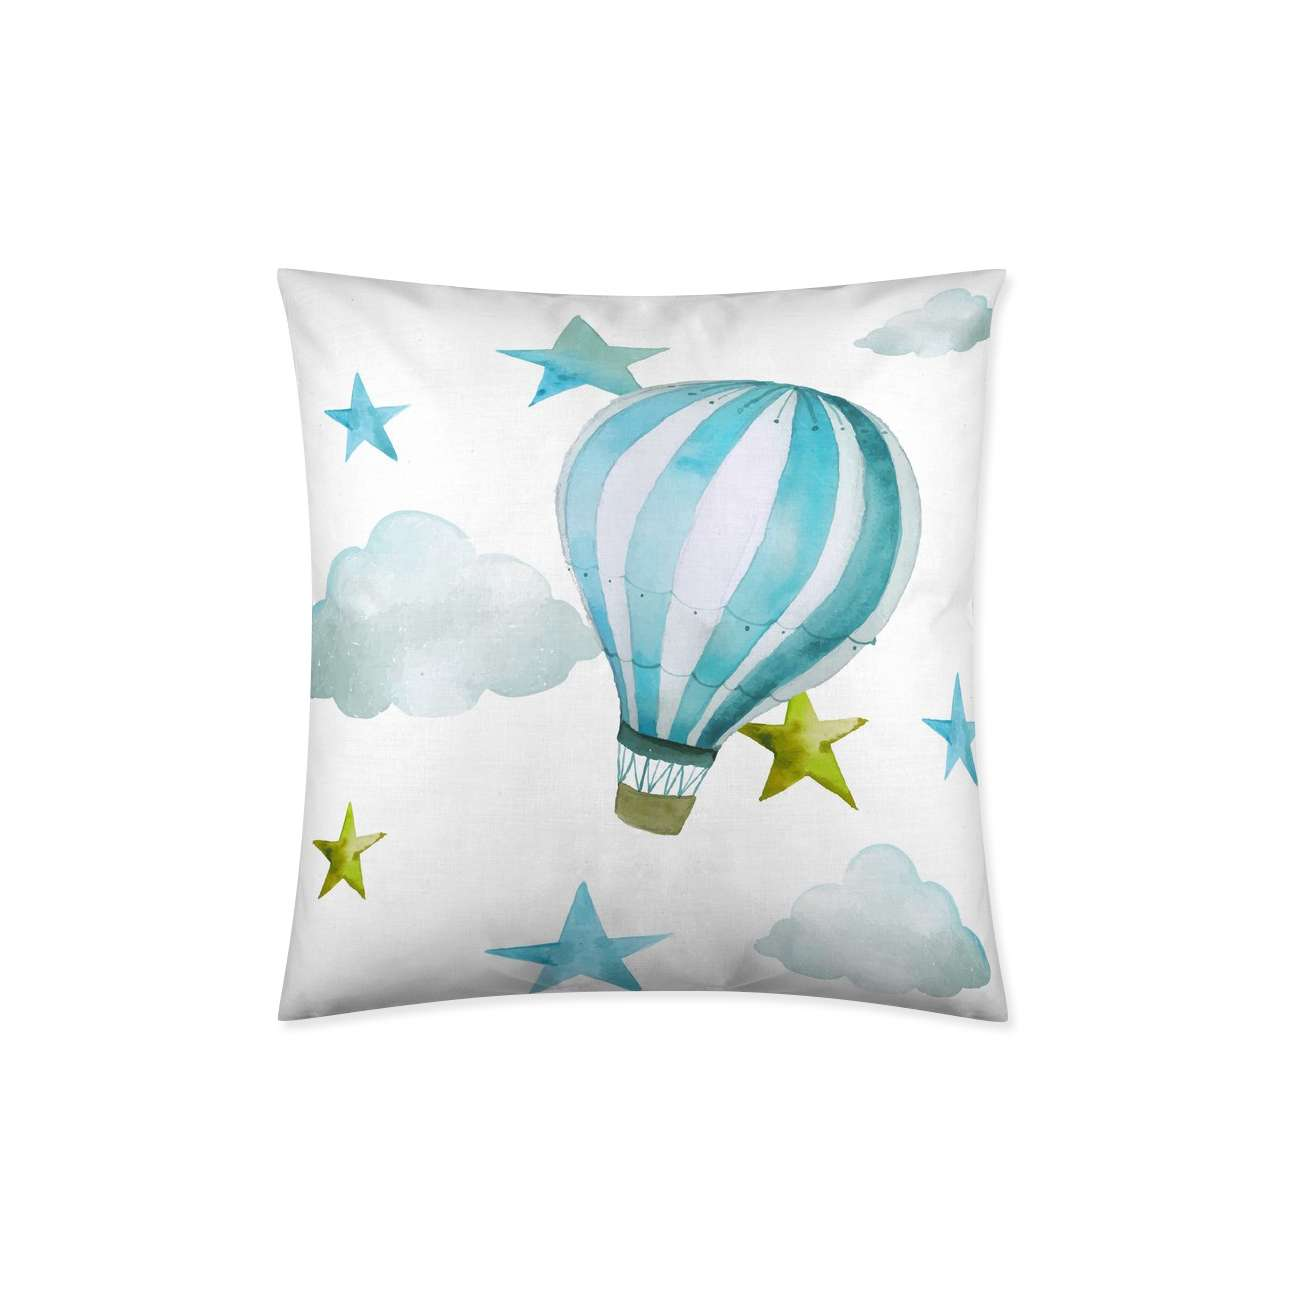 Kussenhoes Turquoise Balloon 45x45cm